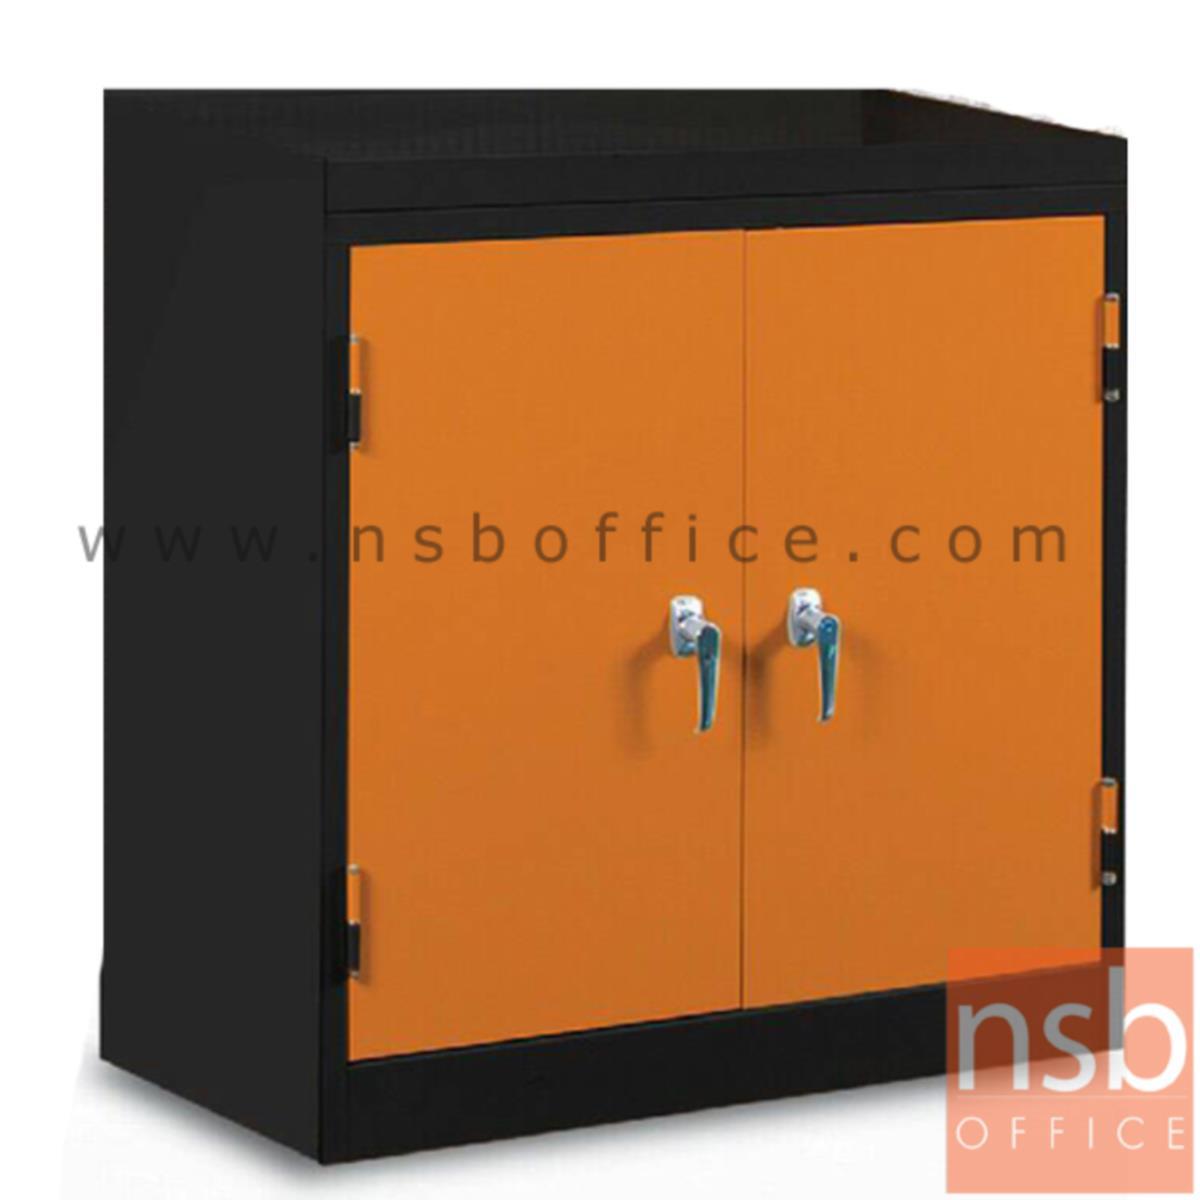 E08A069:ตู้เก็บเครื่องมือช่าง 2 บานเปิดเตี้ย รุ่น MCB36 ขนาด 91.6W*45.7D*90H cm.